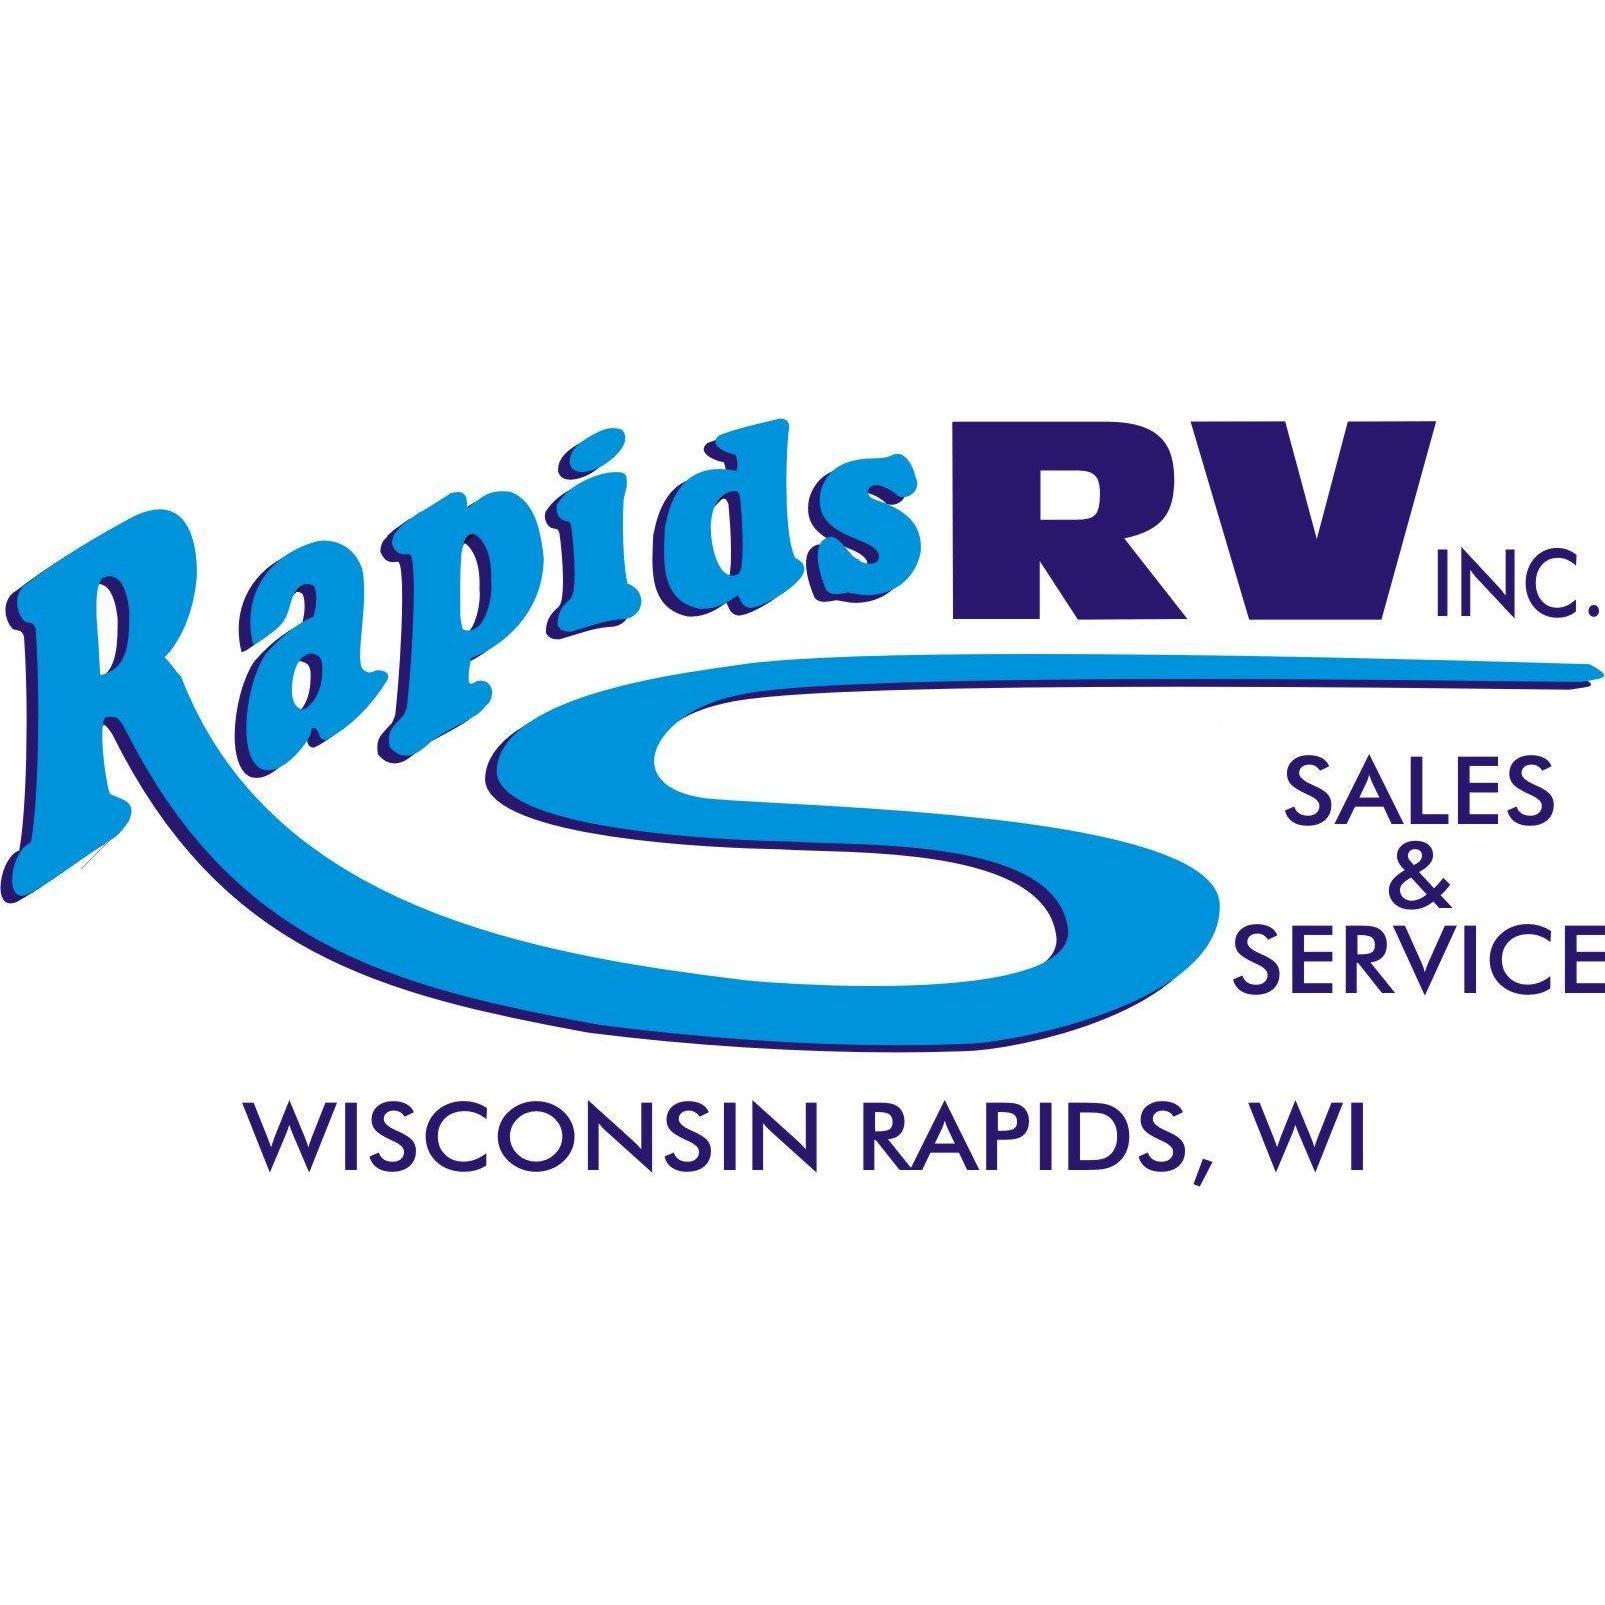 Rapids RV, Inc. image 5